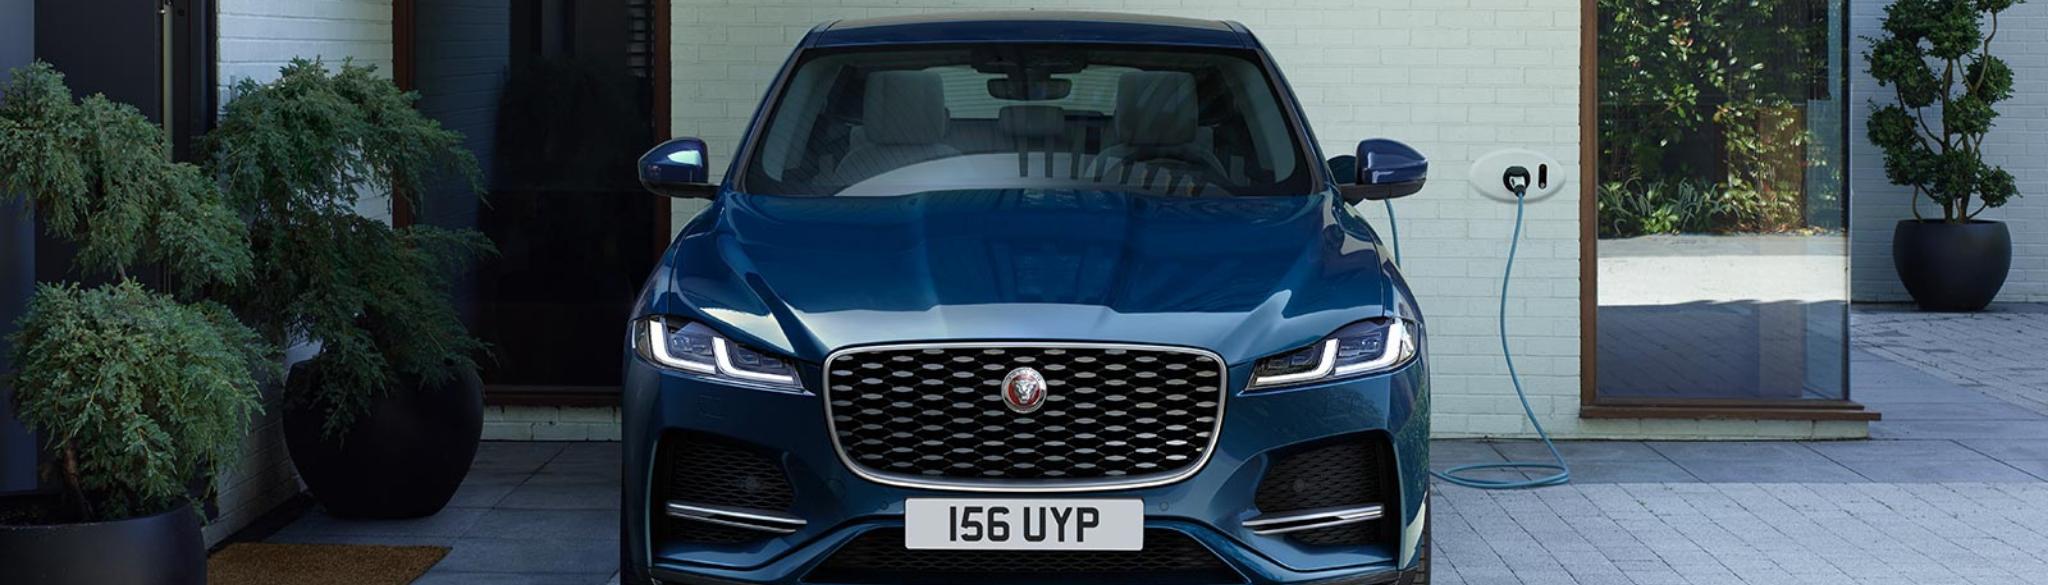 Jaguar F PACE Plug In Hybrid